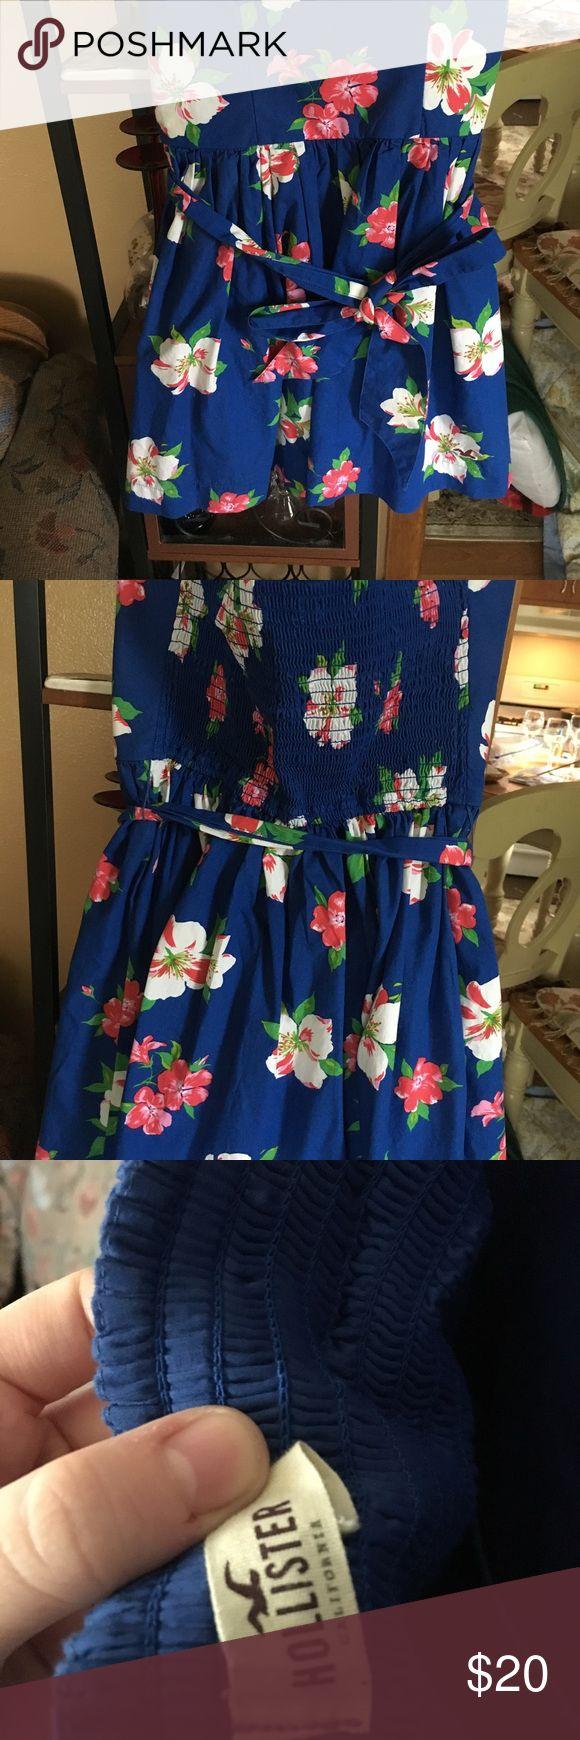 Hollister Strapless Sundress Hollister Sundress Medium size, lightly worn. Hollister Dresses Strapless